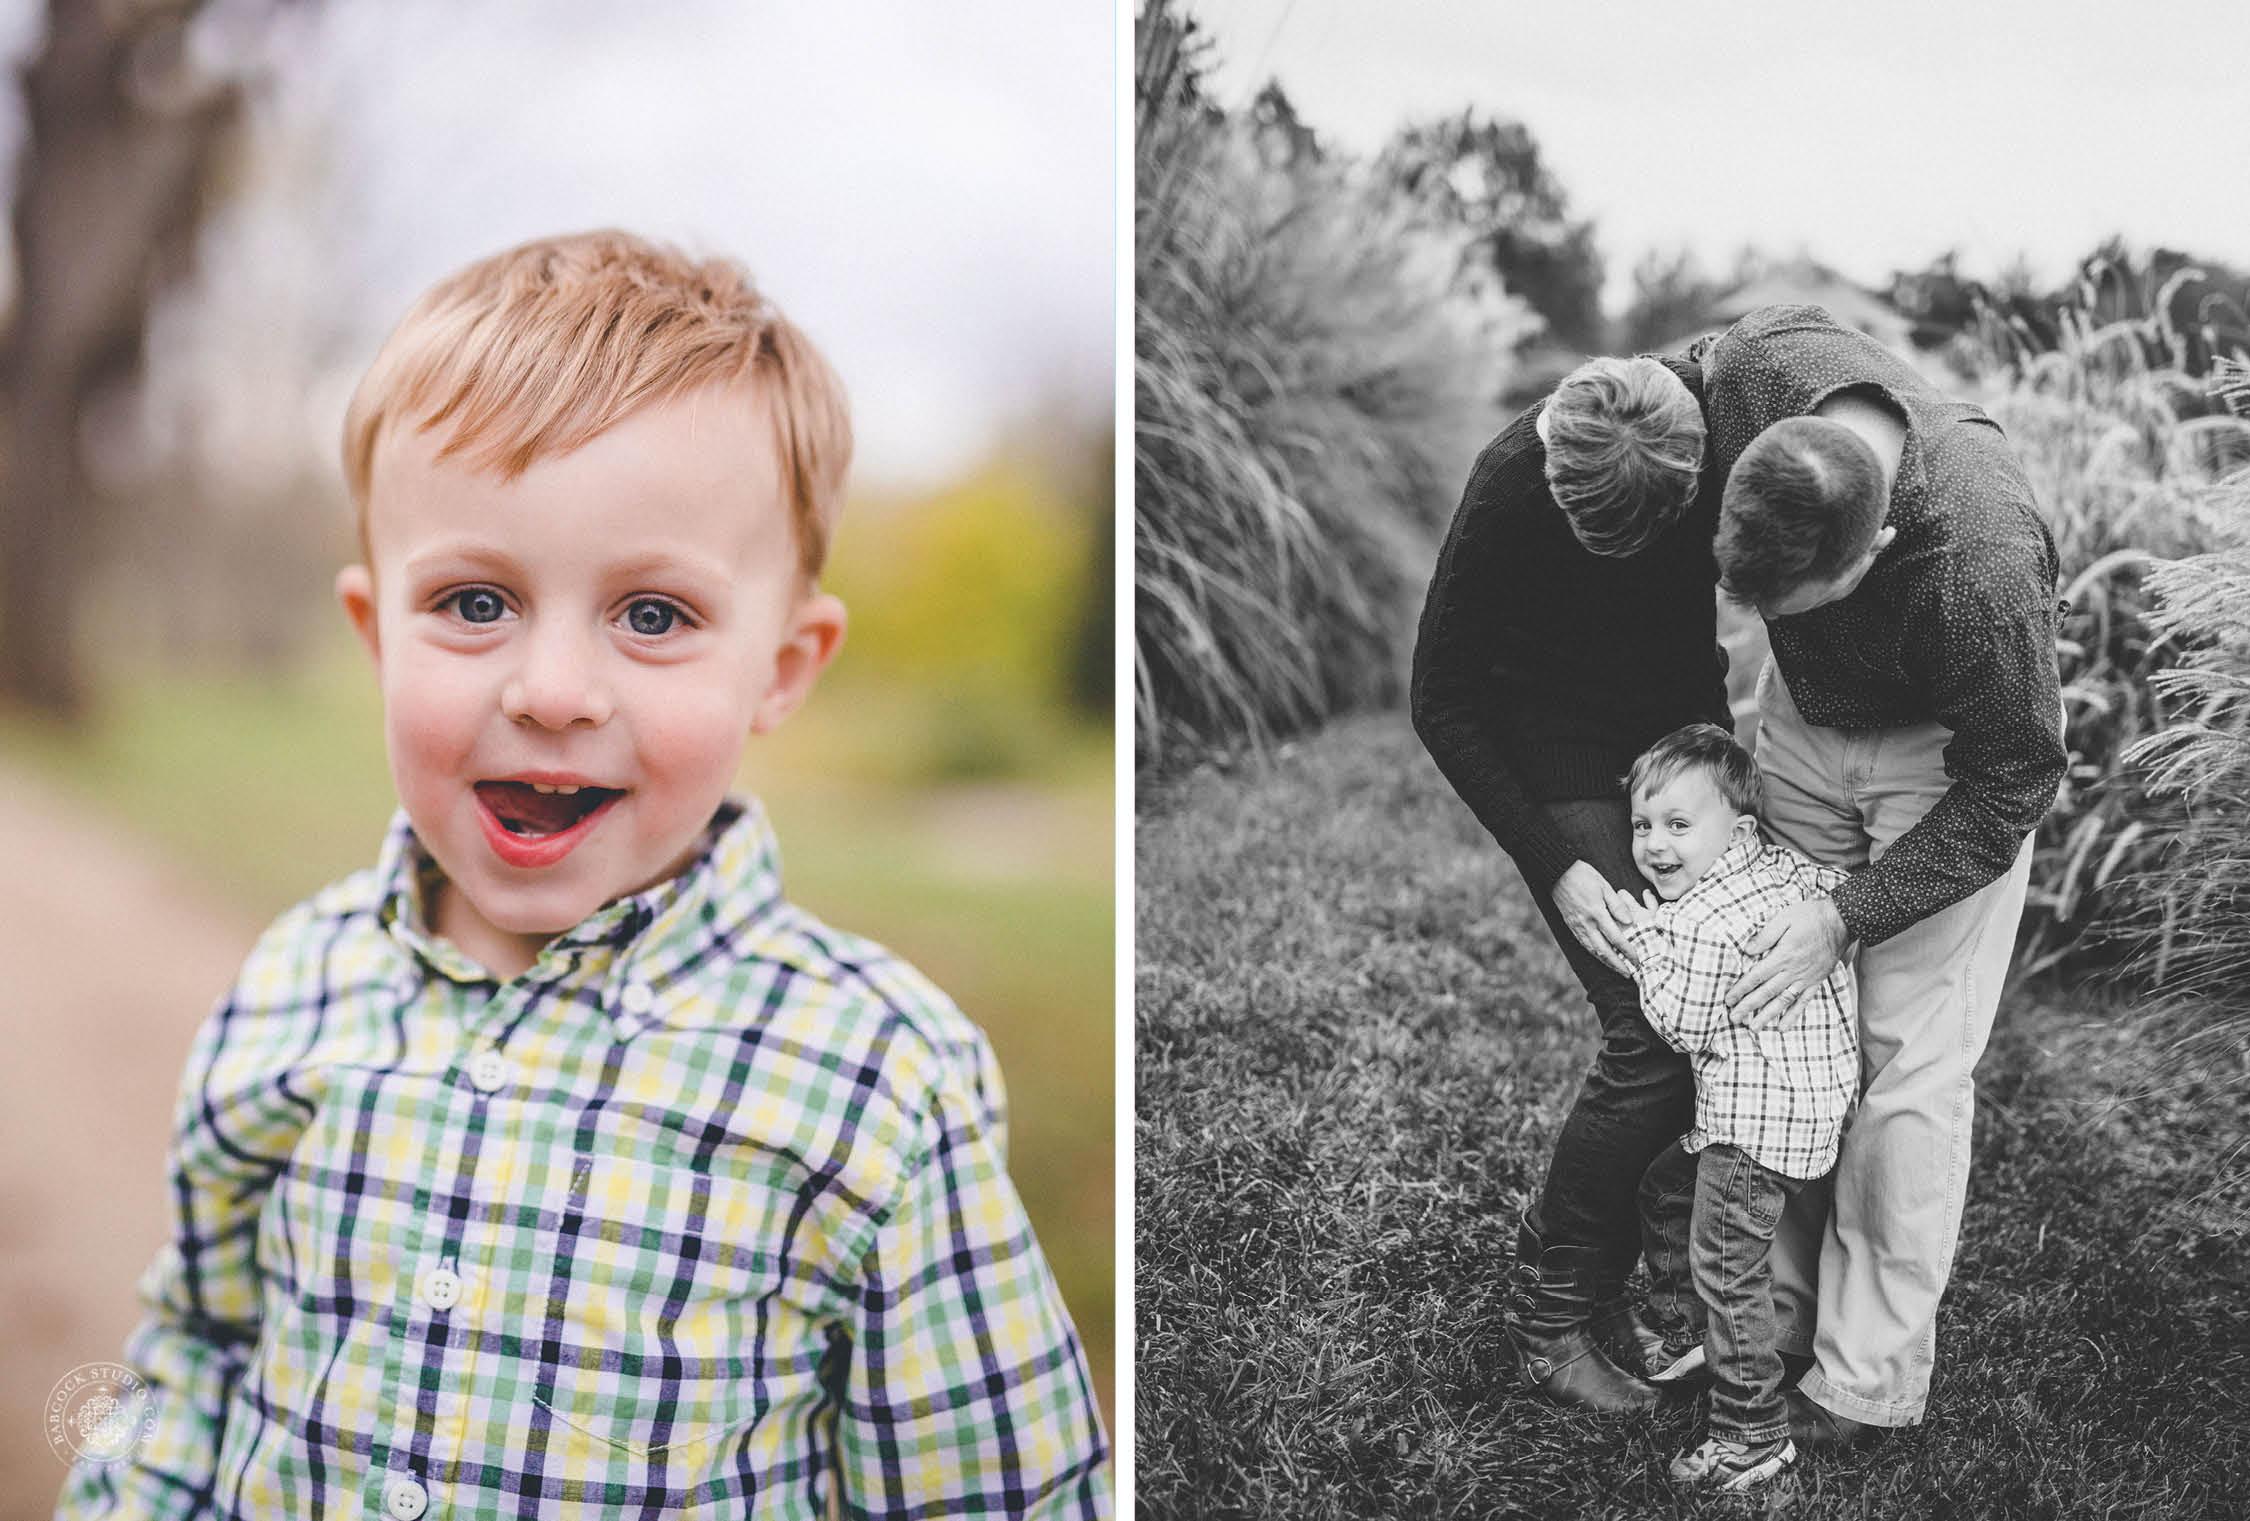 meyer-famly-children-photographer-dayton-ohio-2.jpg